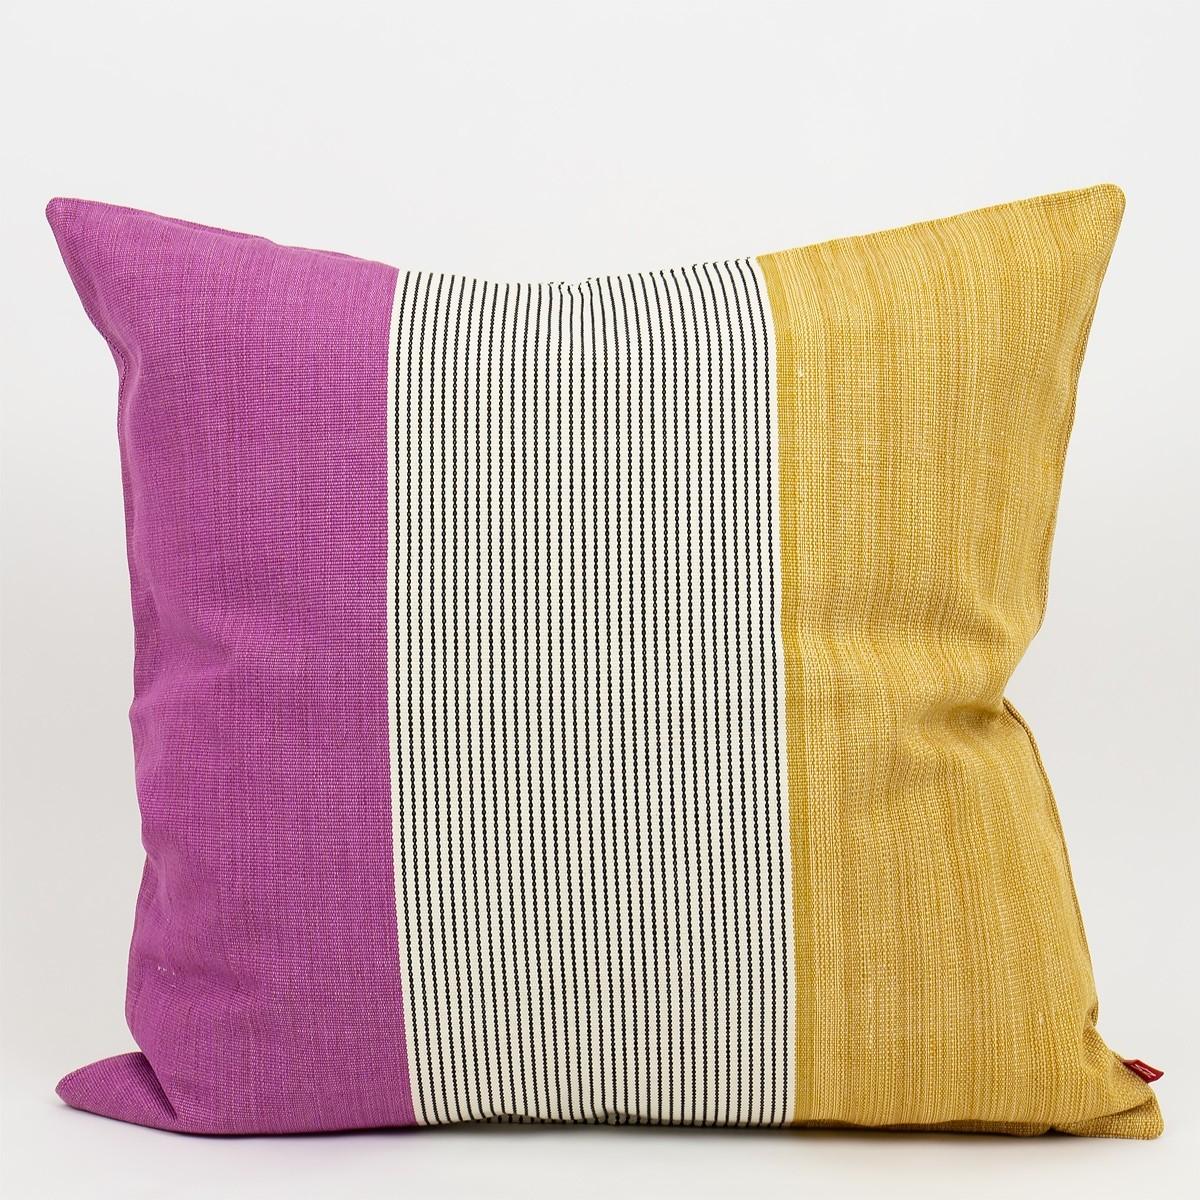 AfroArt Ace Cushion Mustard/Cerise